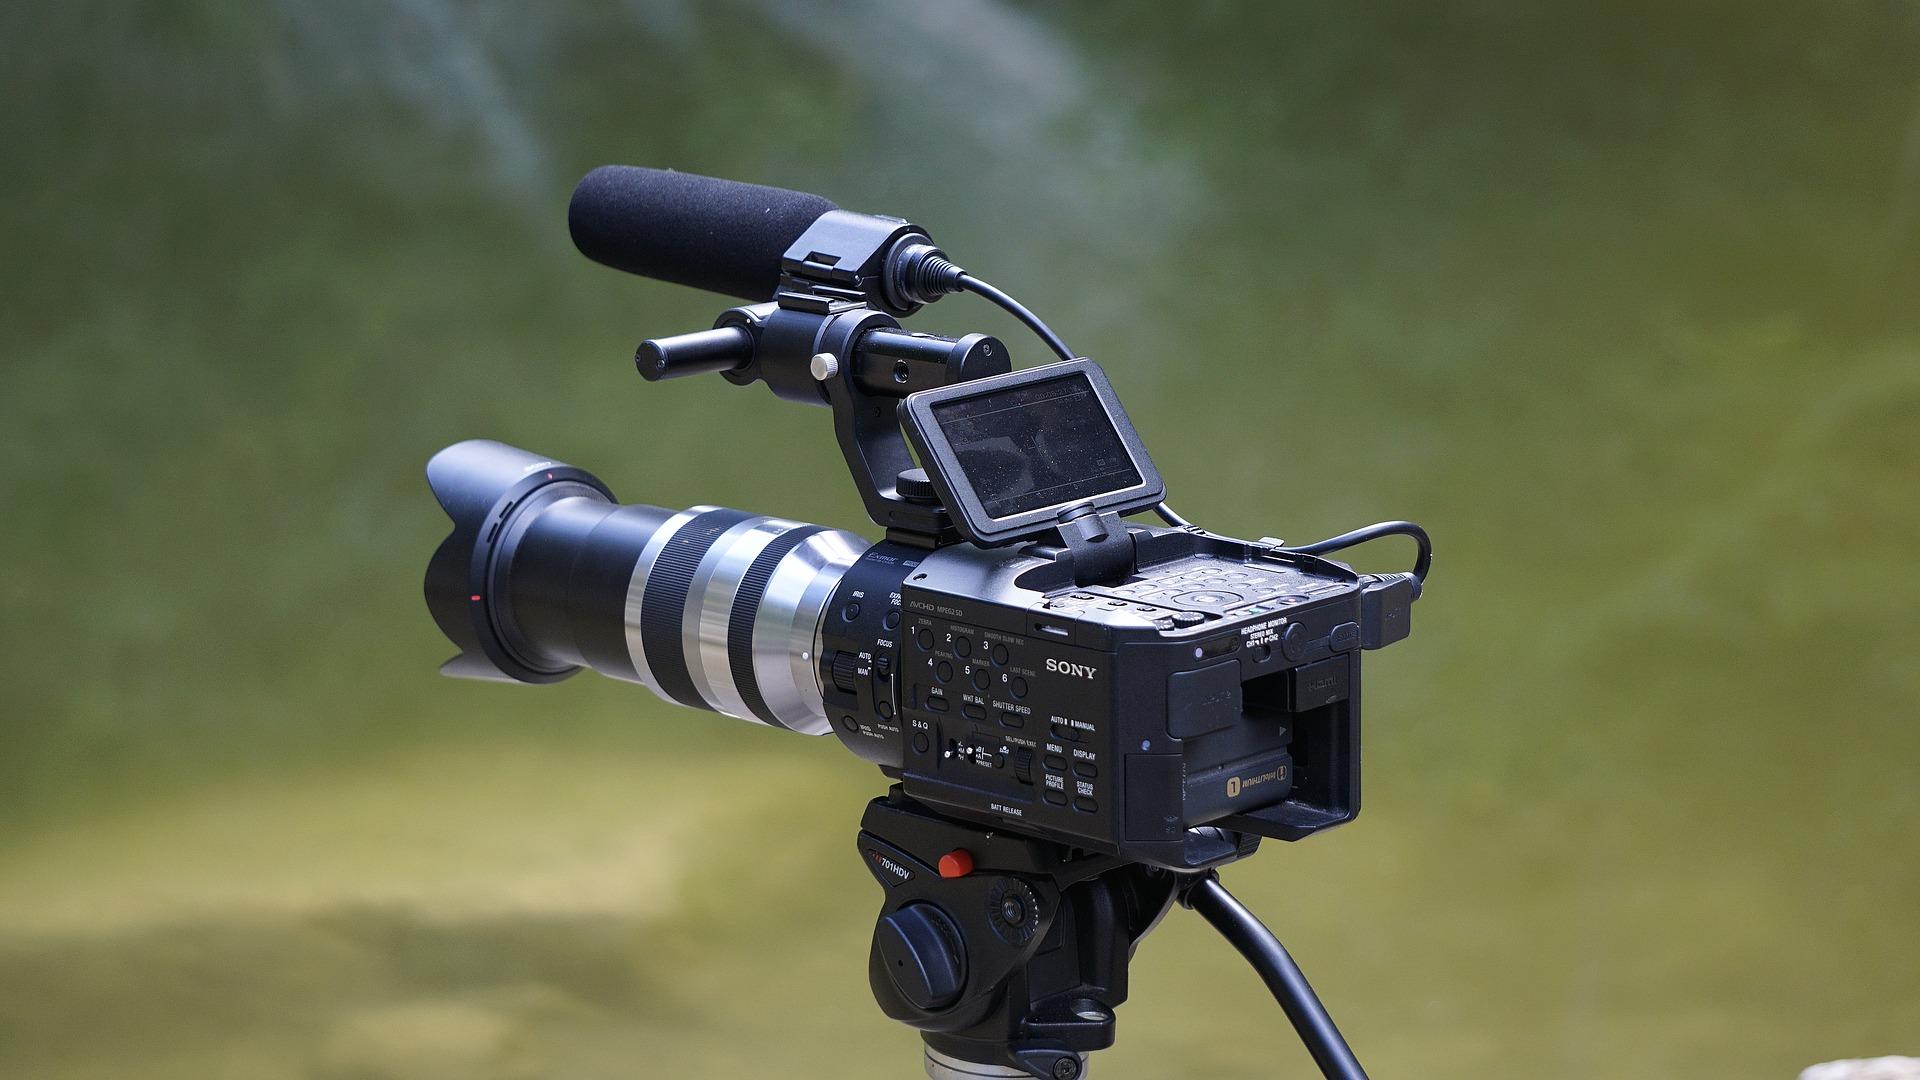 Call for Media Partnership